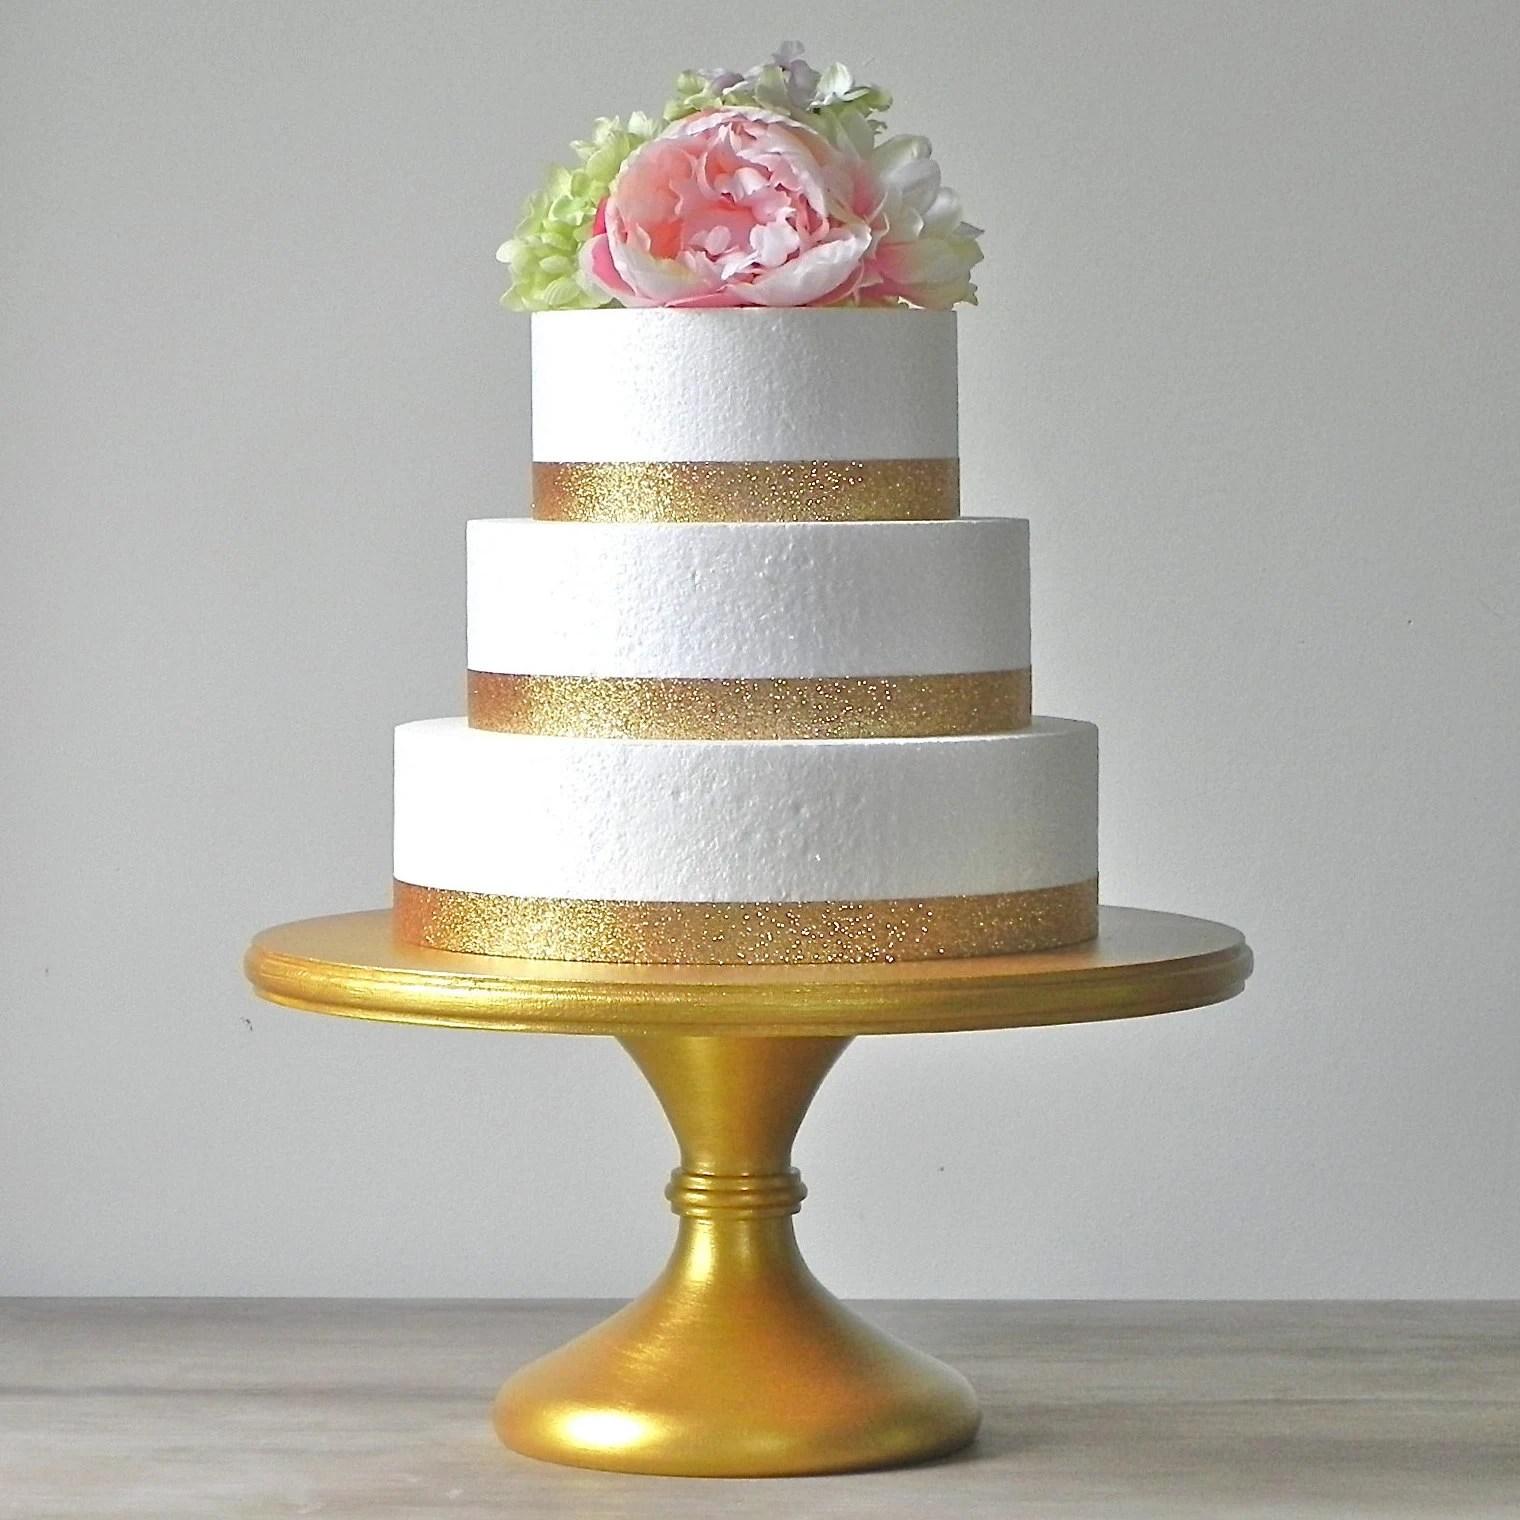 A Favorite Cake Stand Shop Of Martha Stewart By